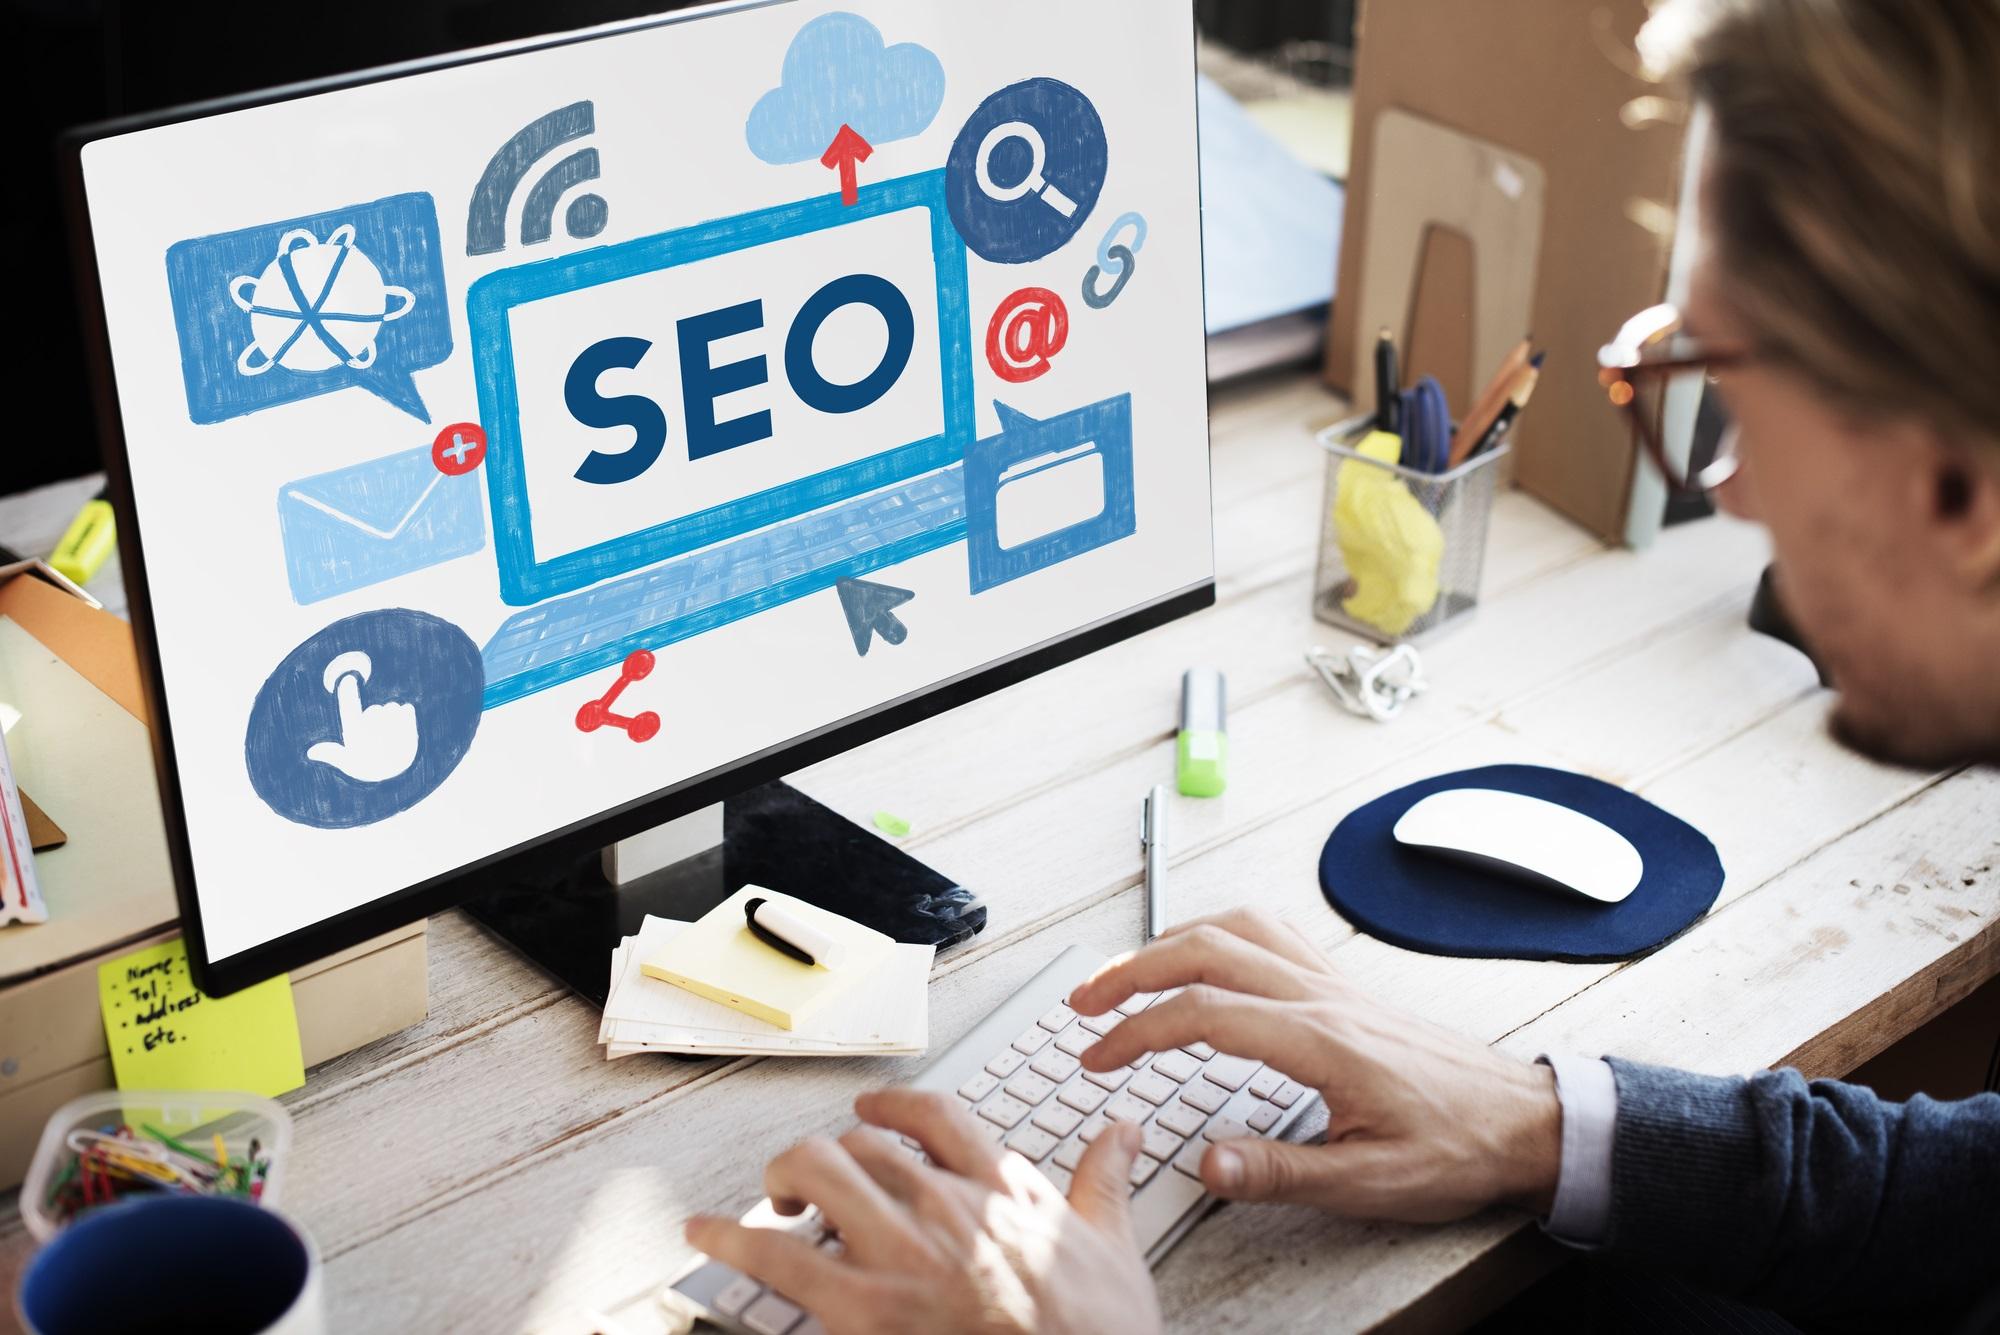 Search Engine Optimization Business Data Digital Concept